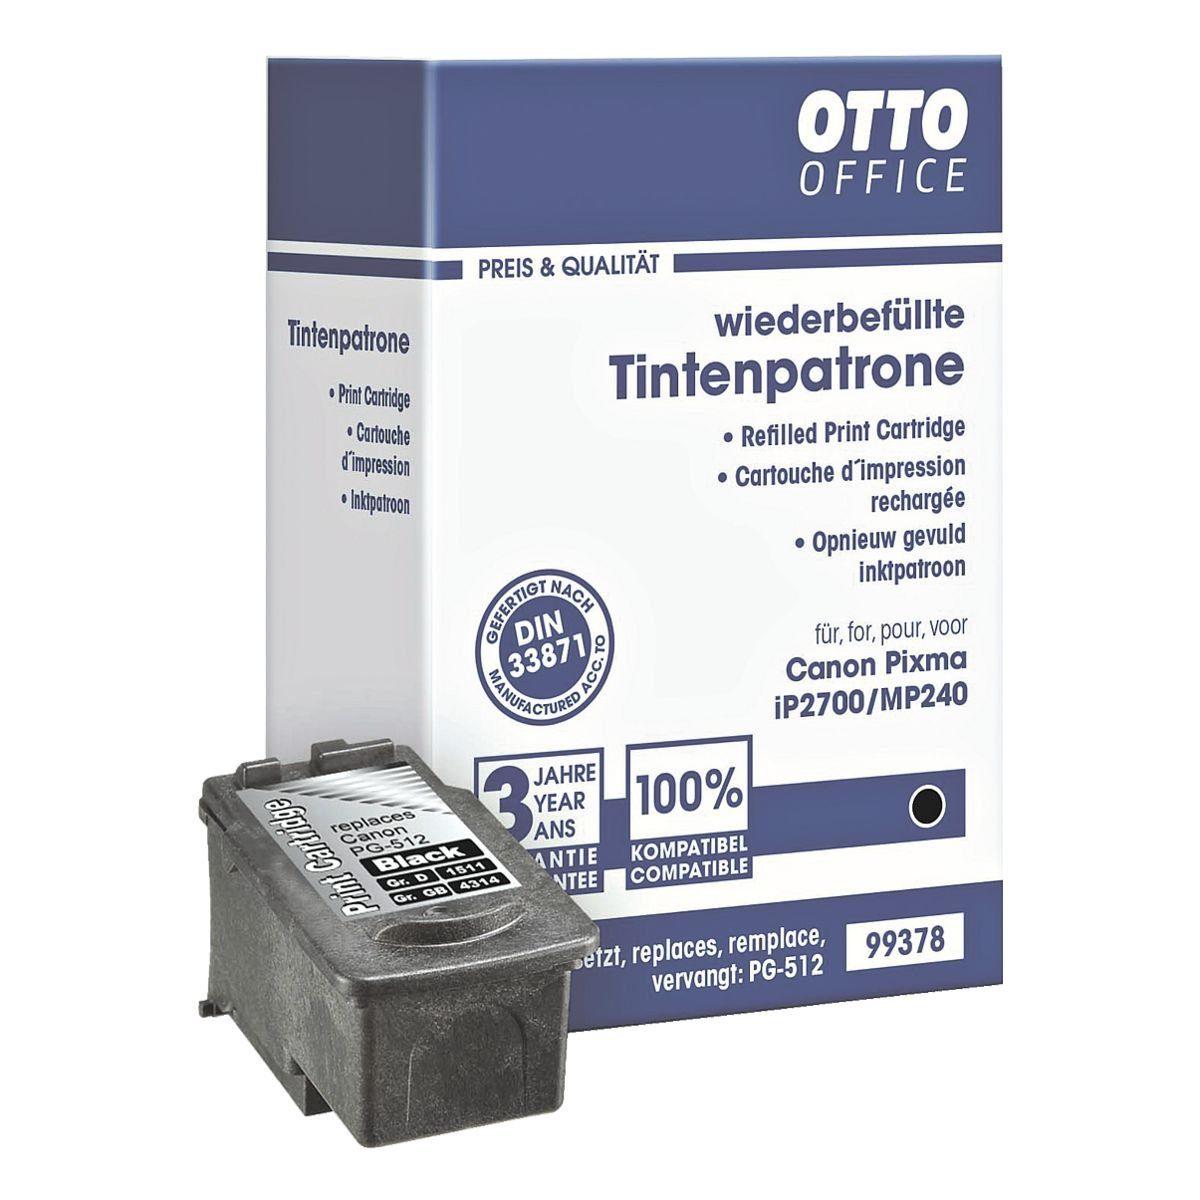 OTTO Office Standard Tintenpatrone ersetzt Canon »PG-512«